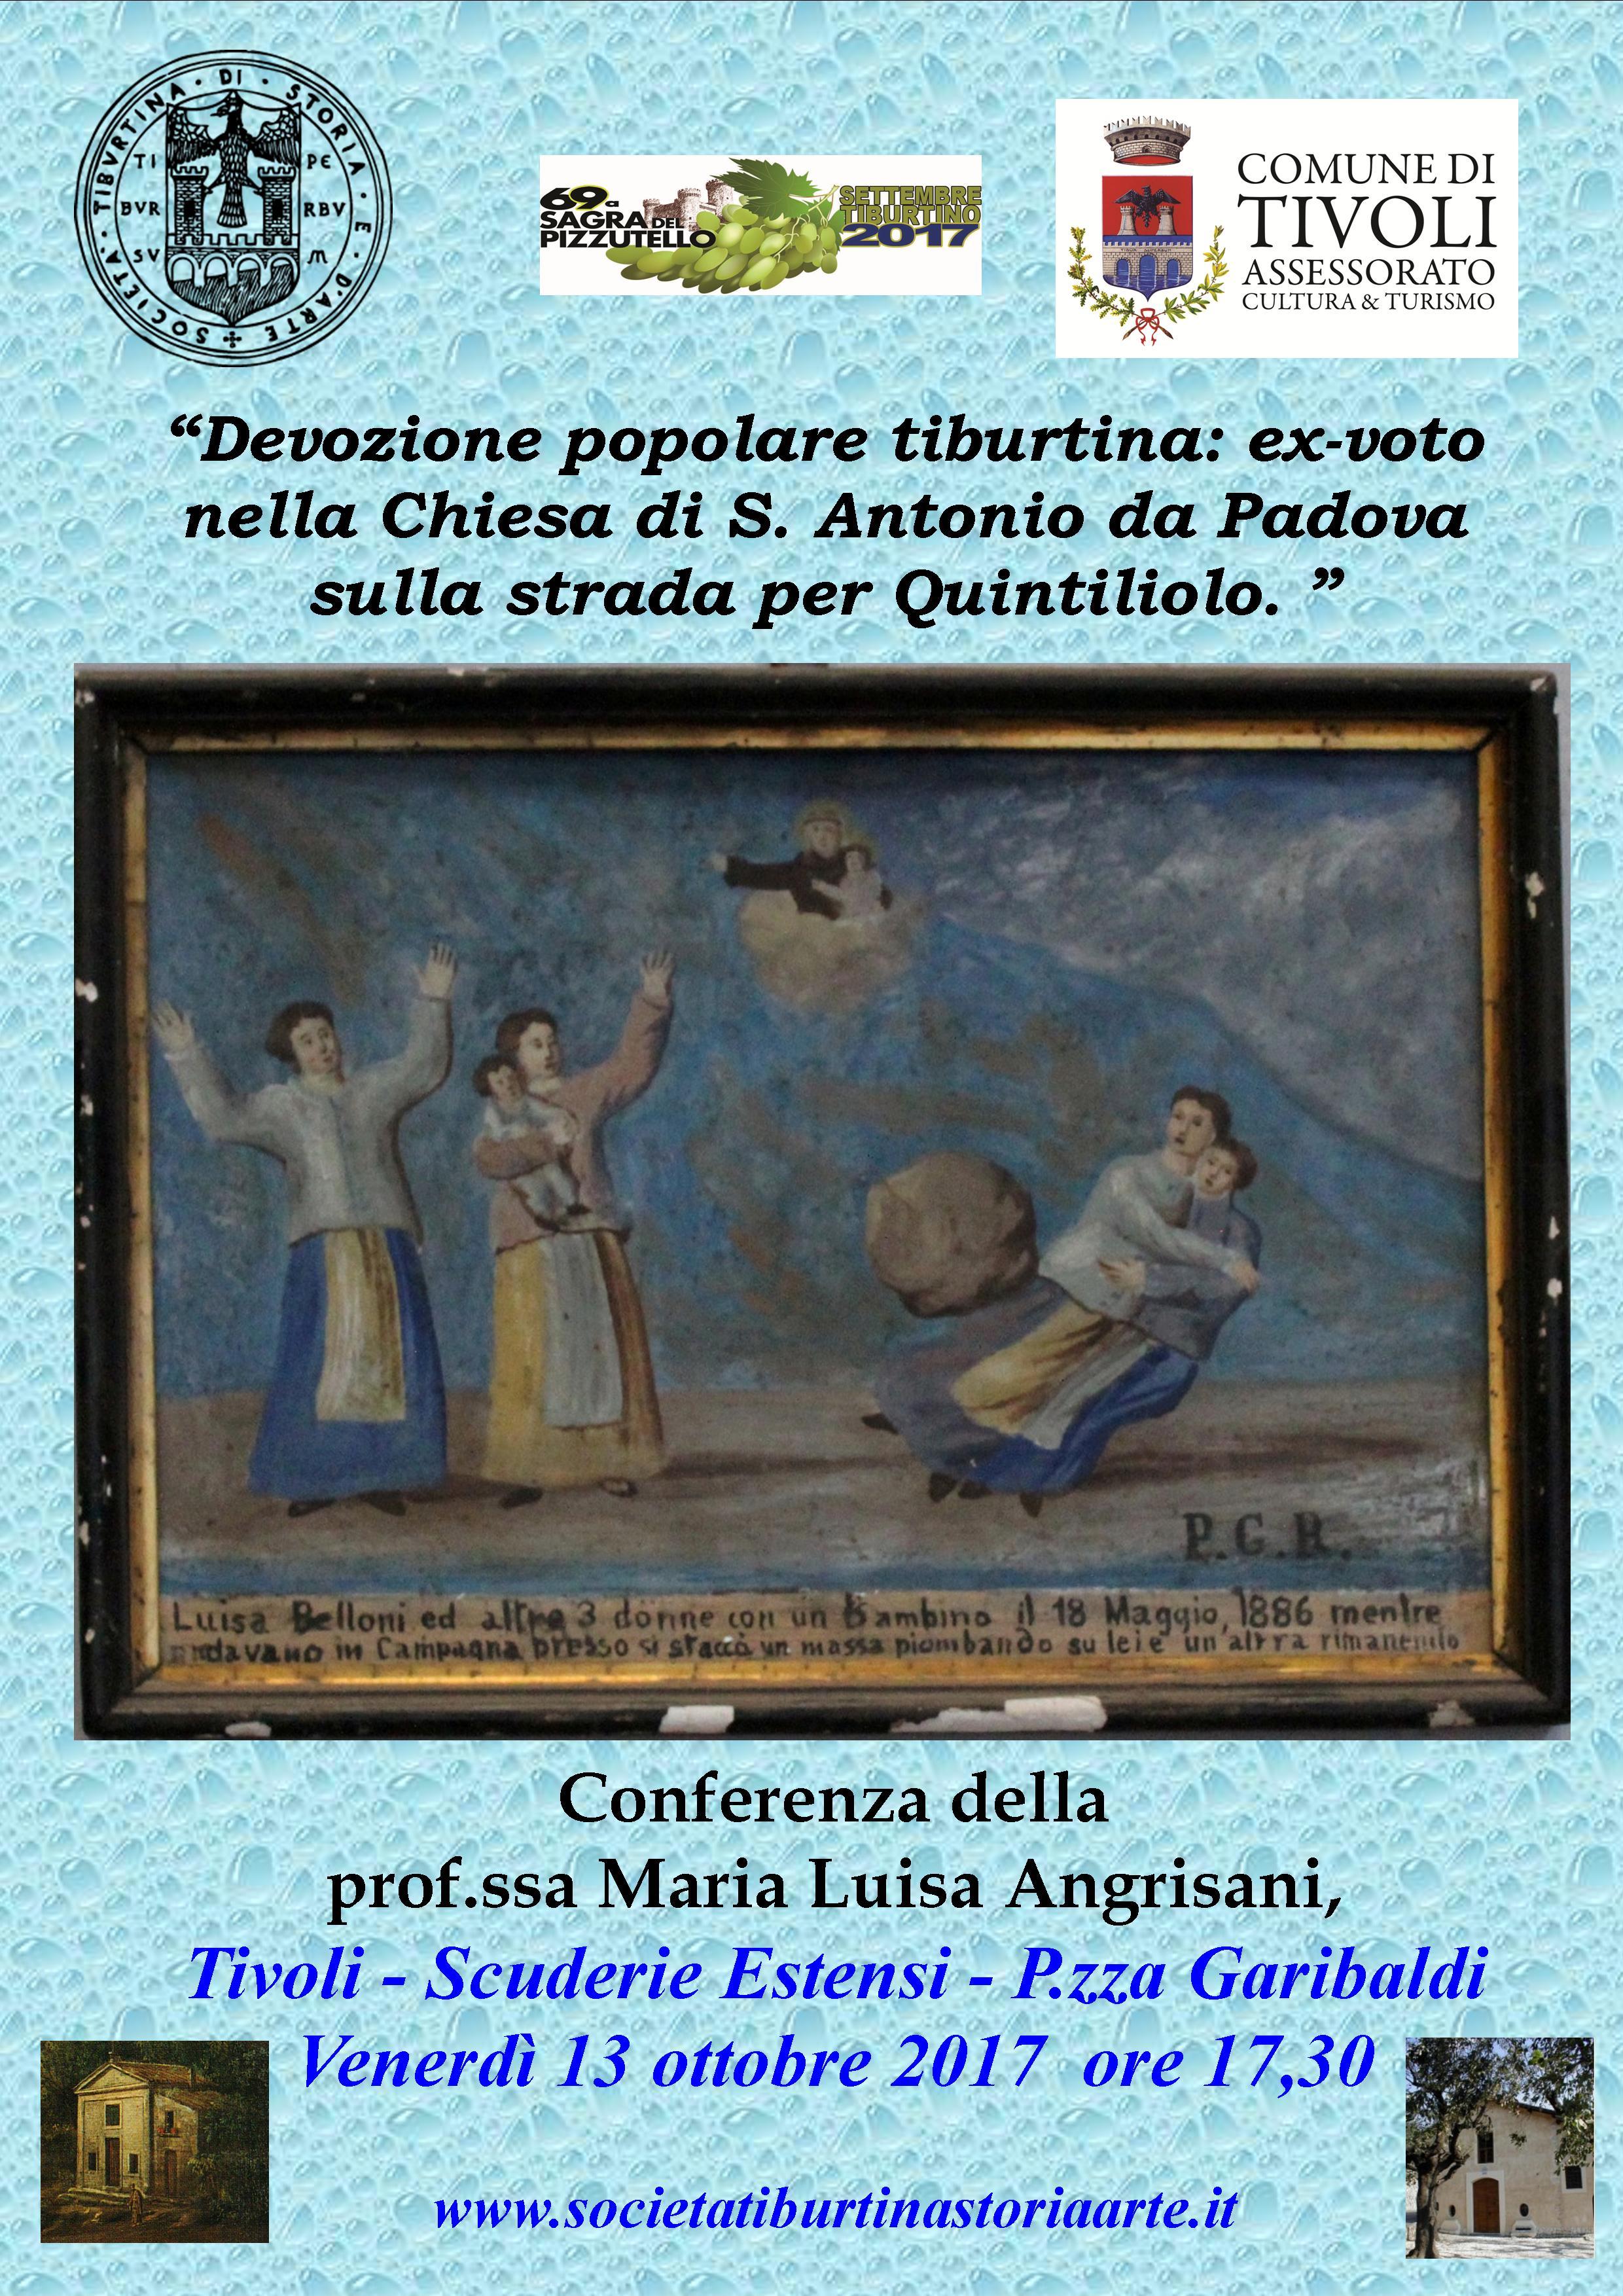 Conferenza_Angrisani_13_ottobre_2017